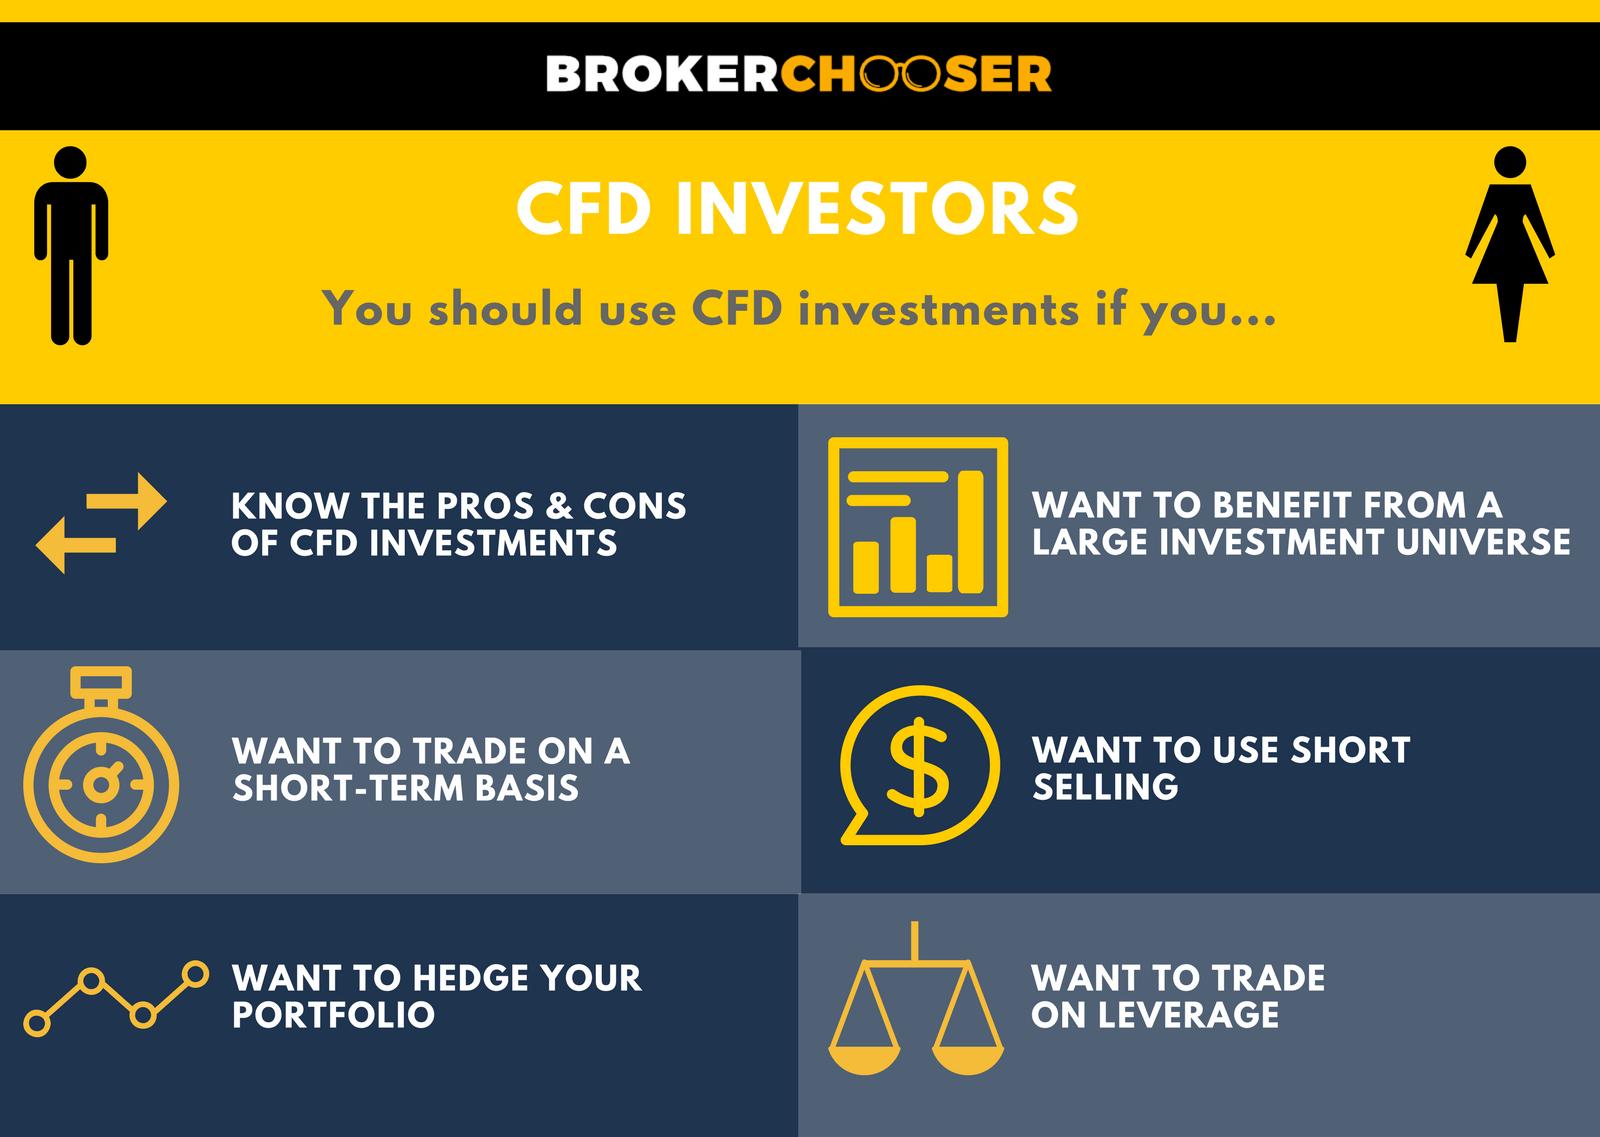 CFD investors